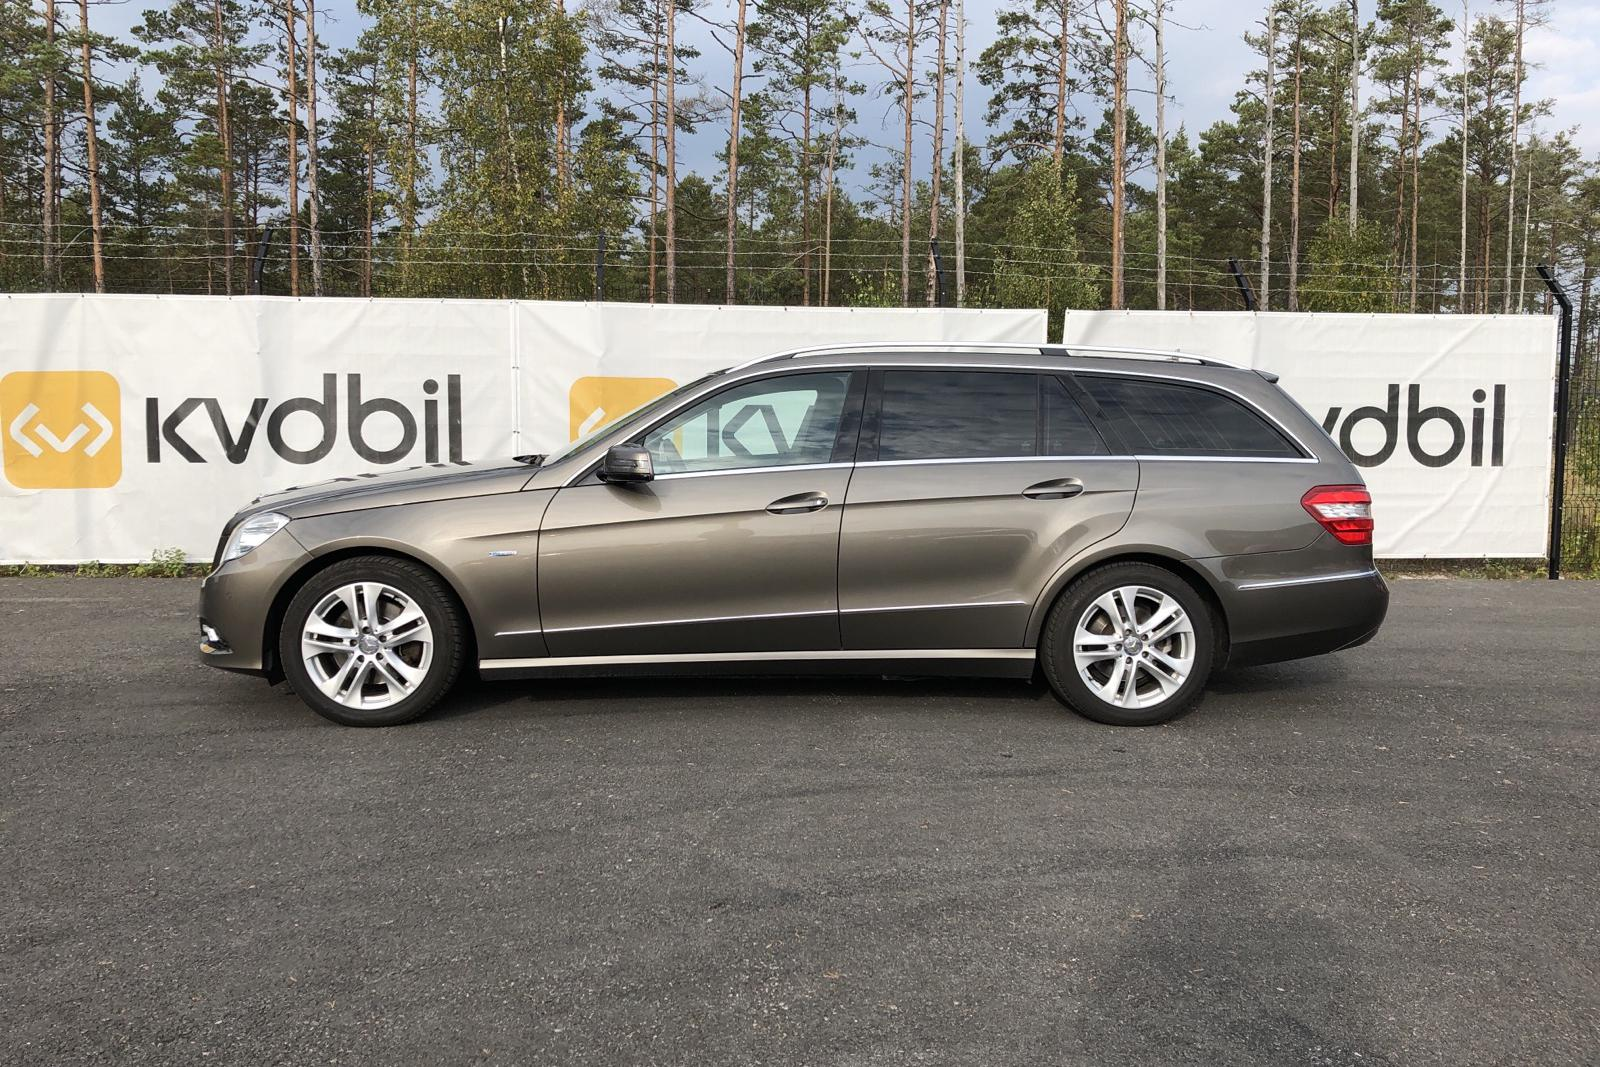 Mercedes E 350 CDI BlueEfficiency Kombi S212 (231hk) - 169 000 km - Automatic - silver - 2010